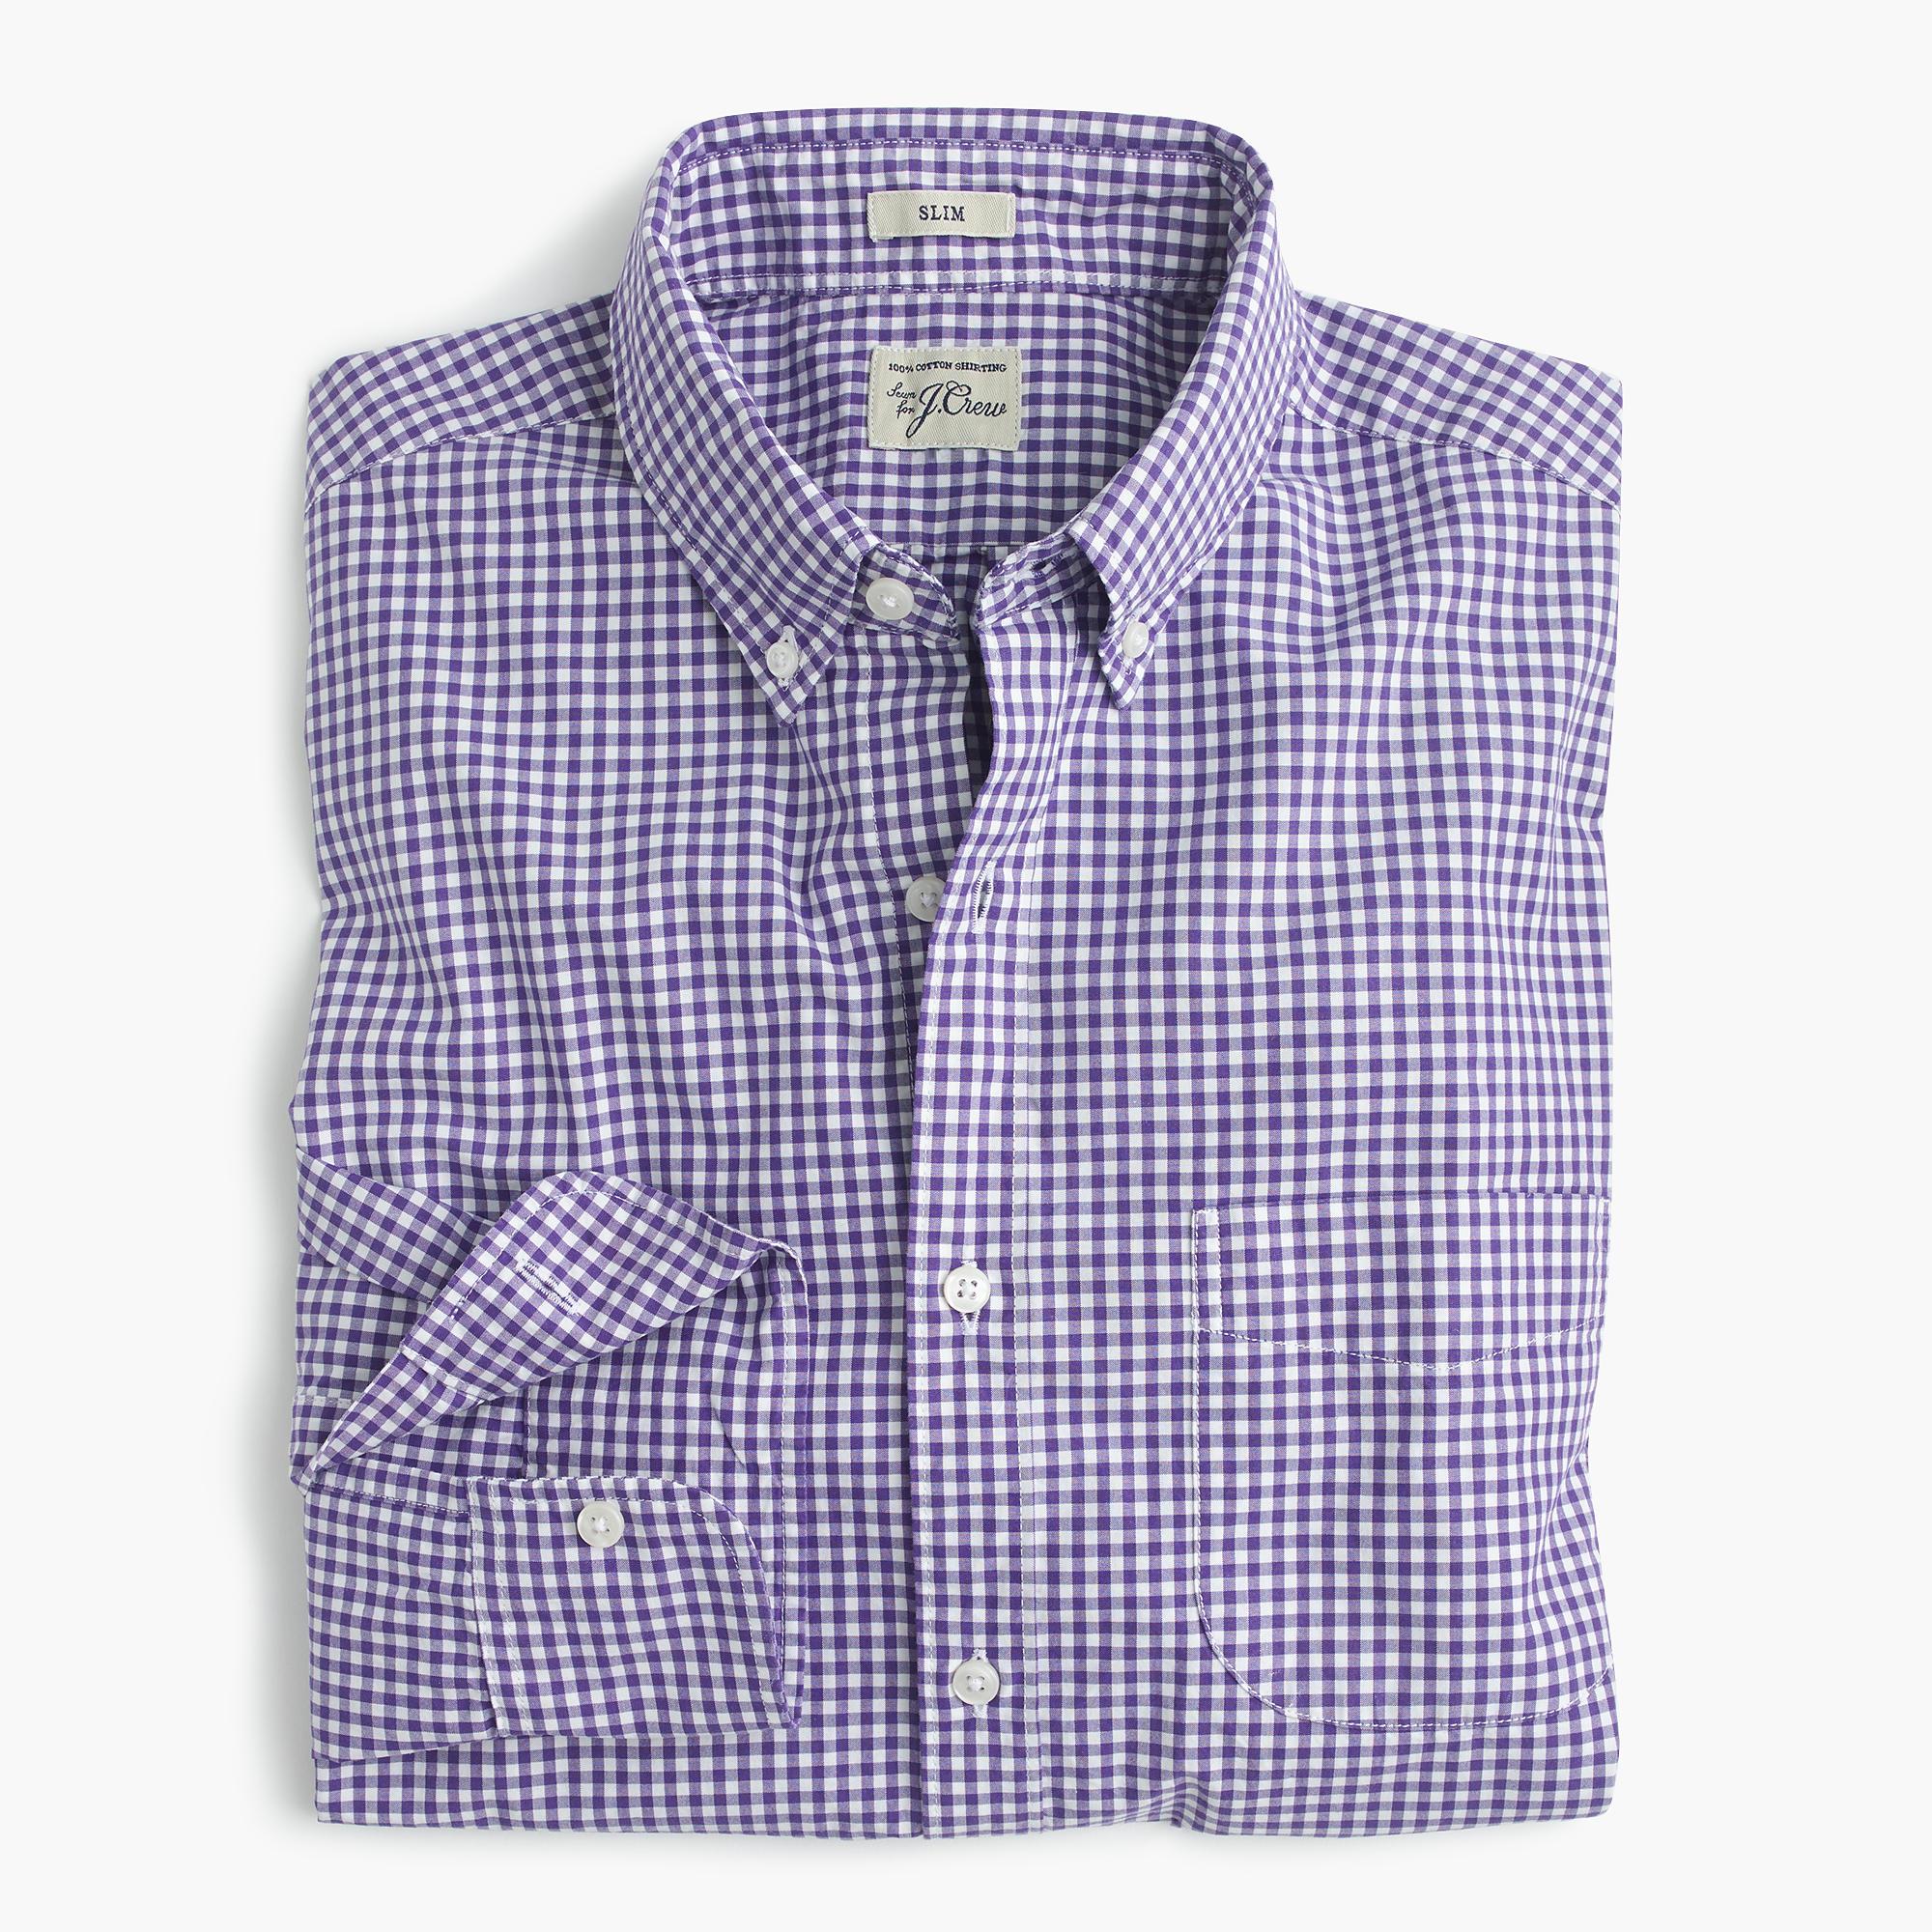 Men's Slim Size Clothing : The Slim Shop | J.Crew